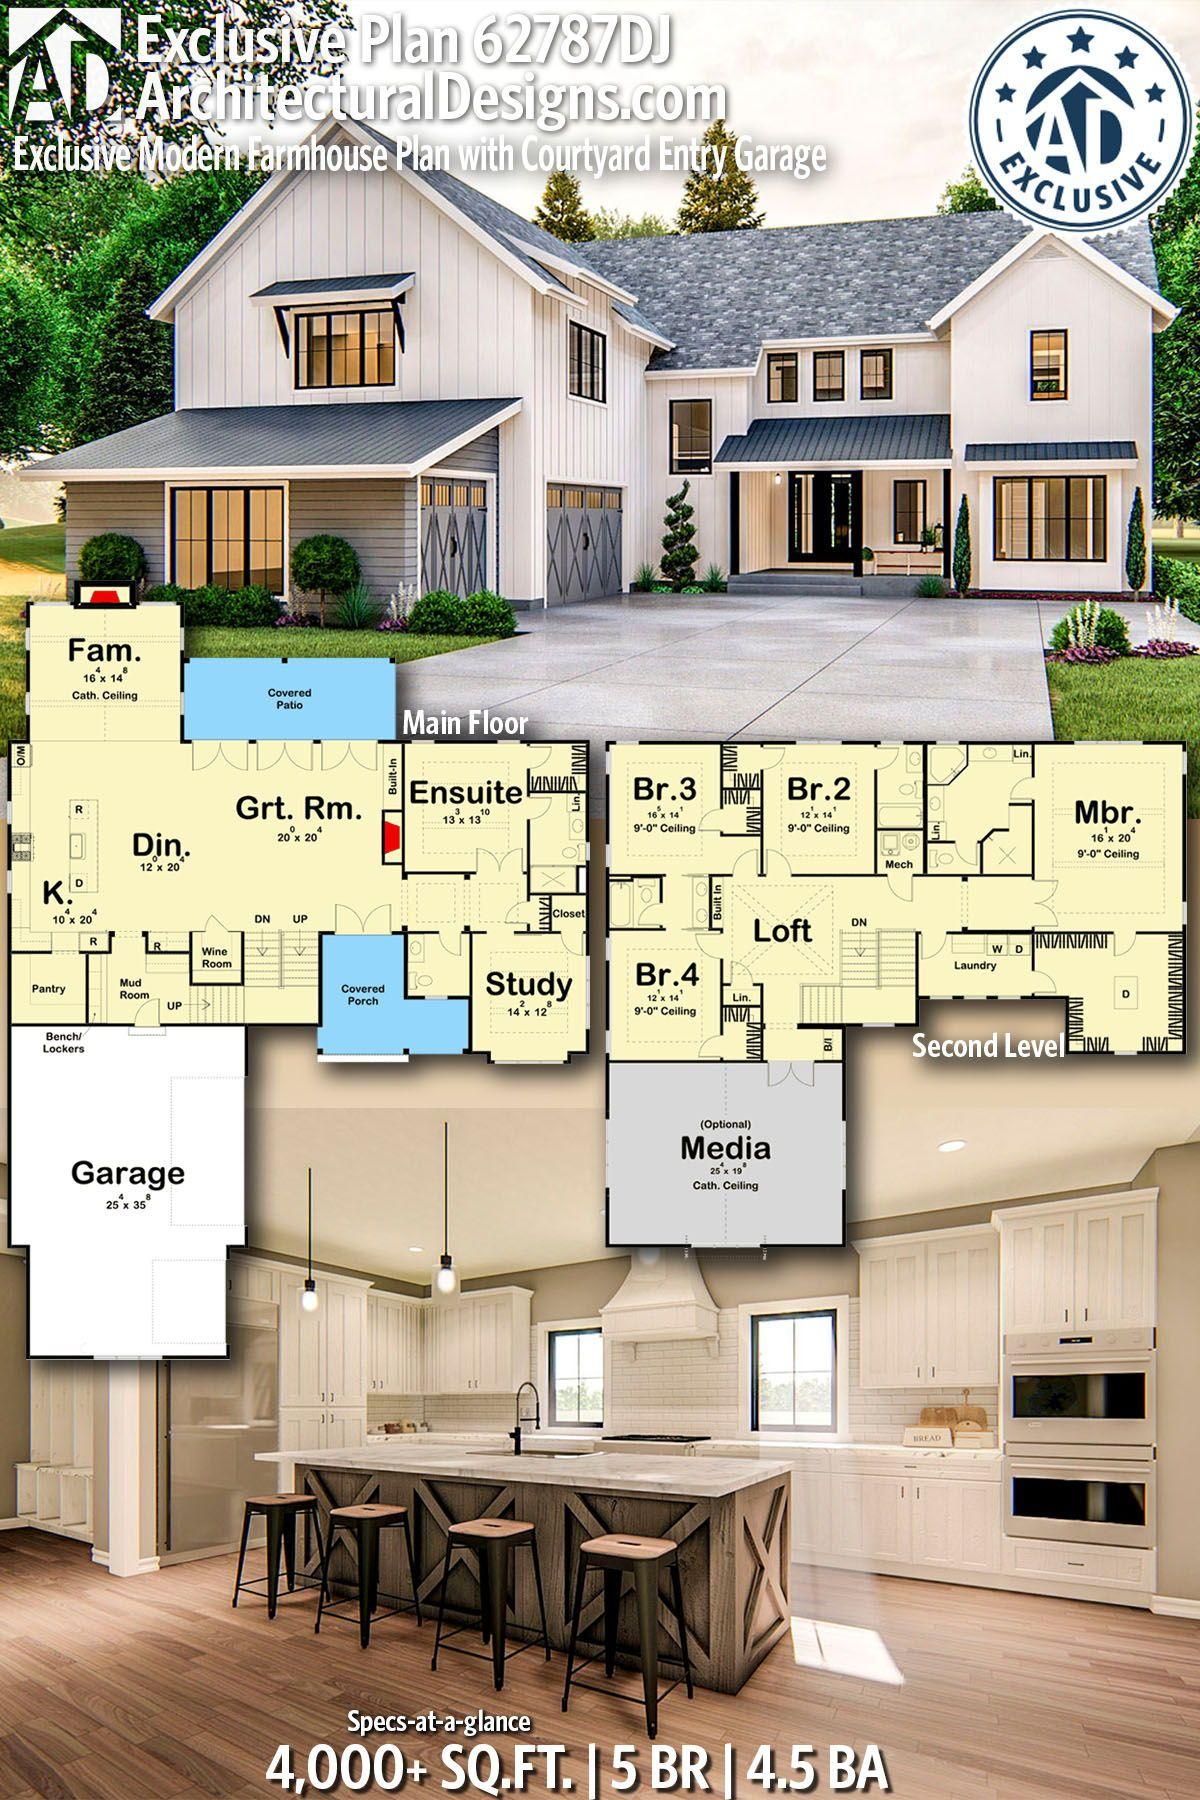 Plan 62787dj Exclusive Modern Farmhouse Plan With Courtyard Entry Garage In 2020 Modern Farmhouse Plans House Plans Farmhouse House Plans